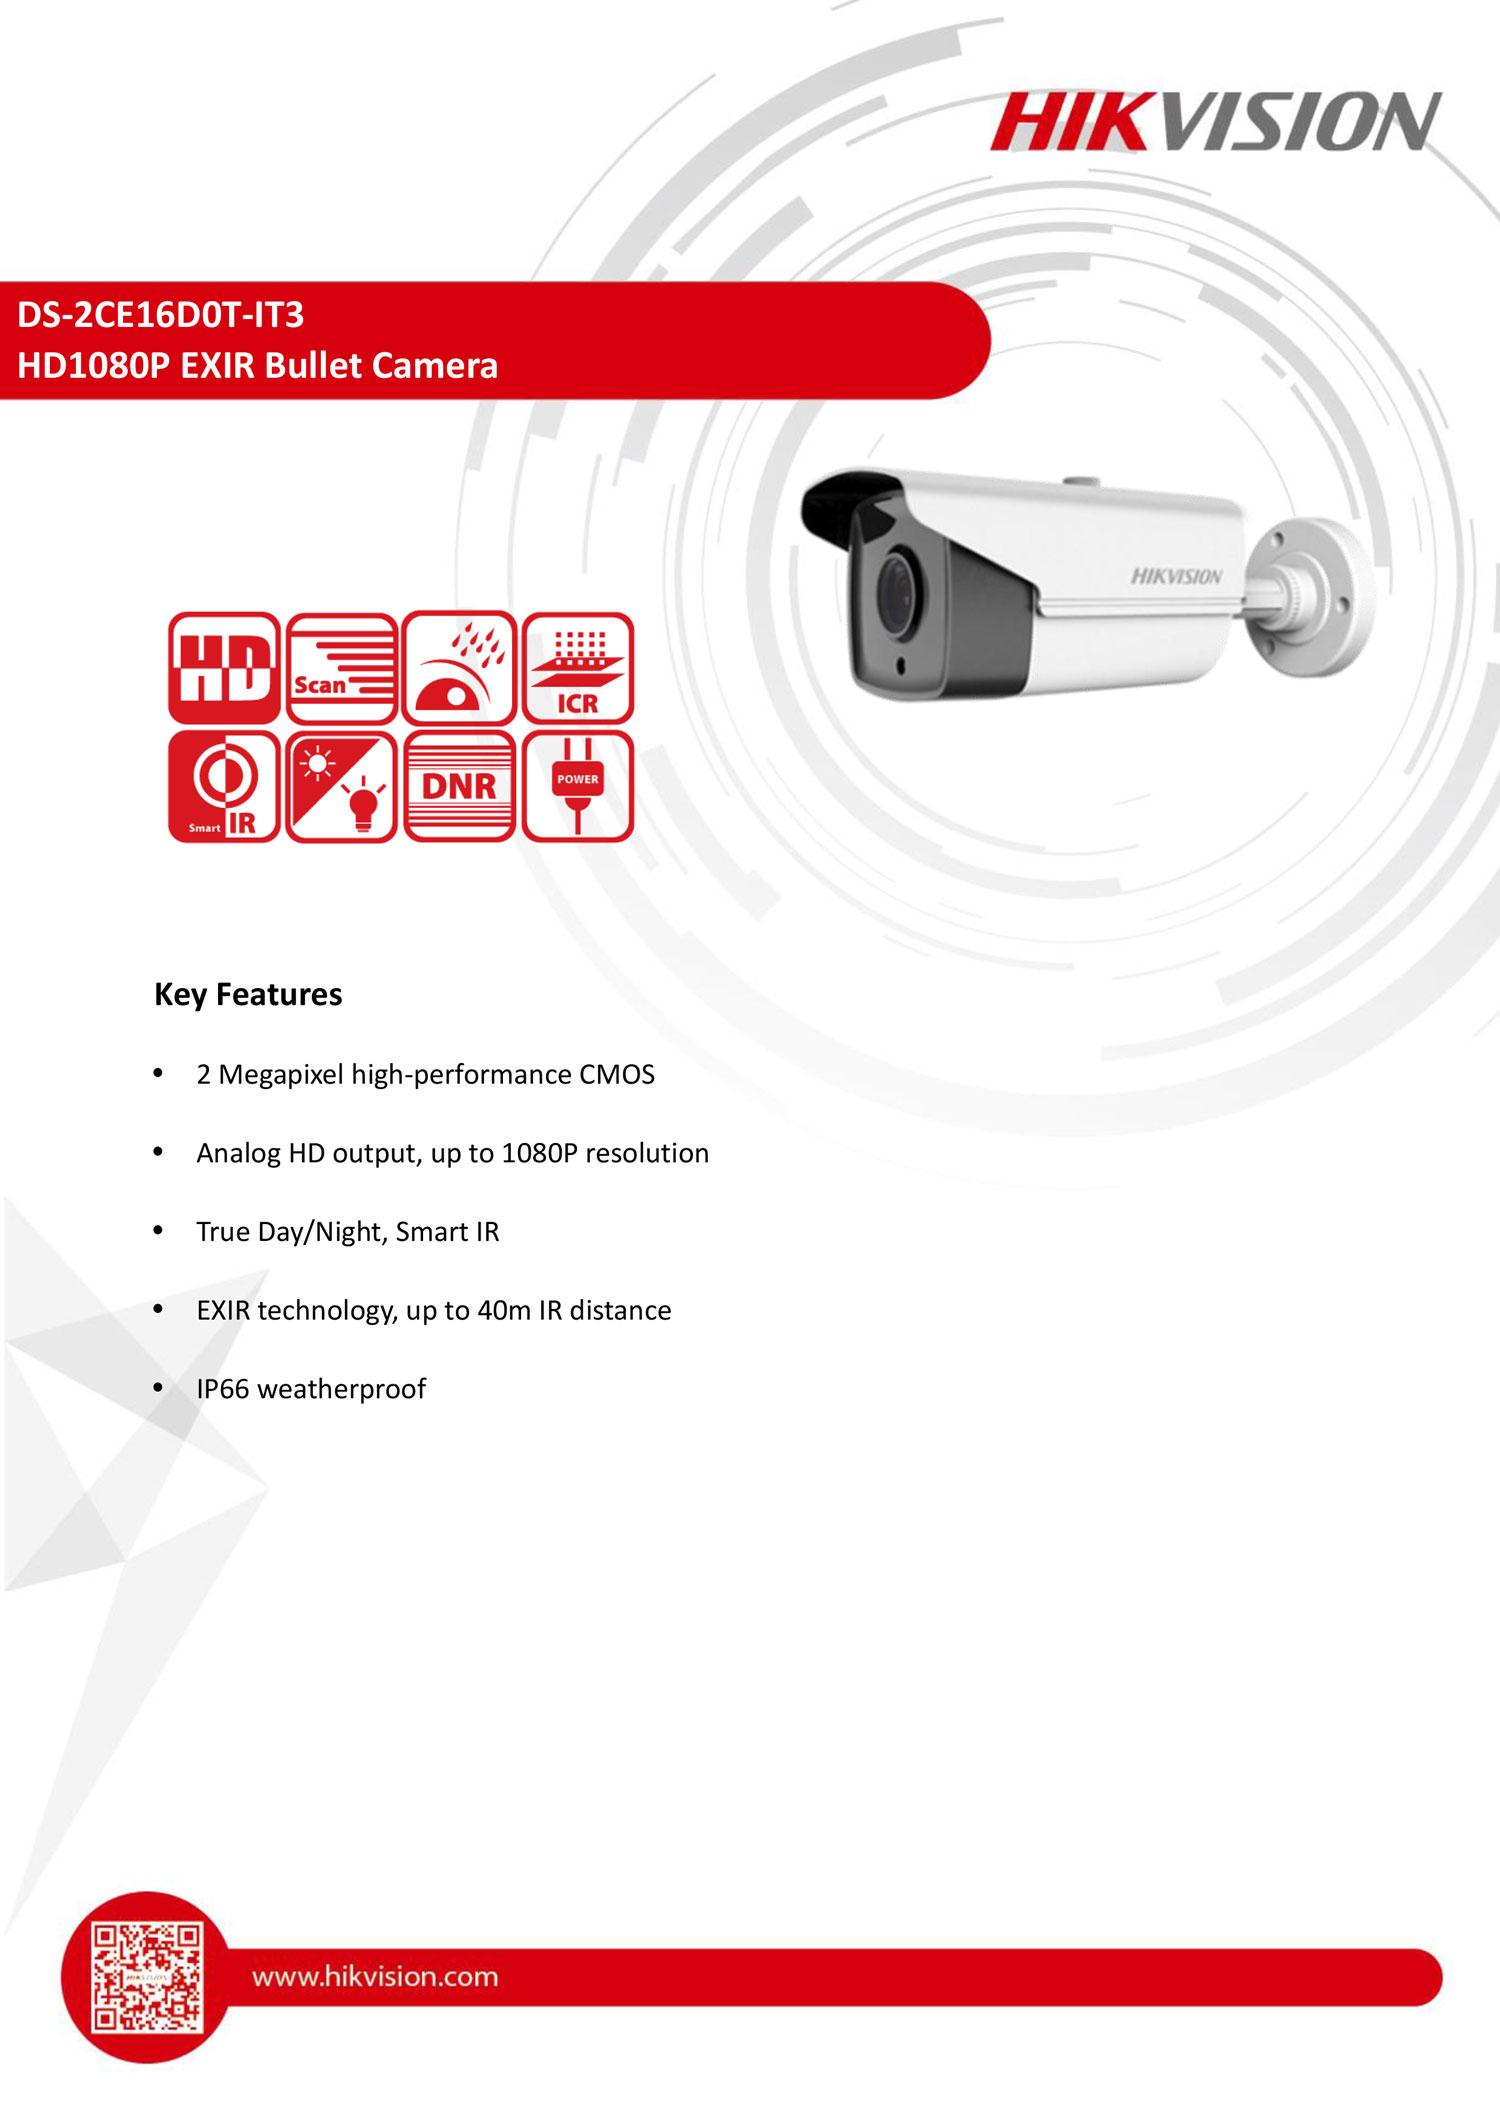 CCTV DS-2CE16D0T-IT3 กล้องวงจรปิด Hikvision